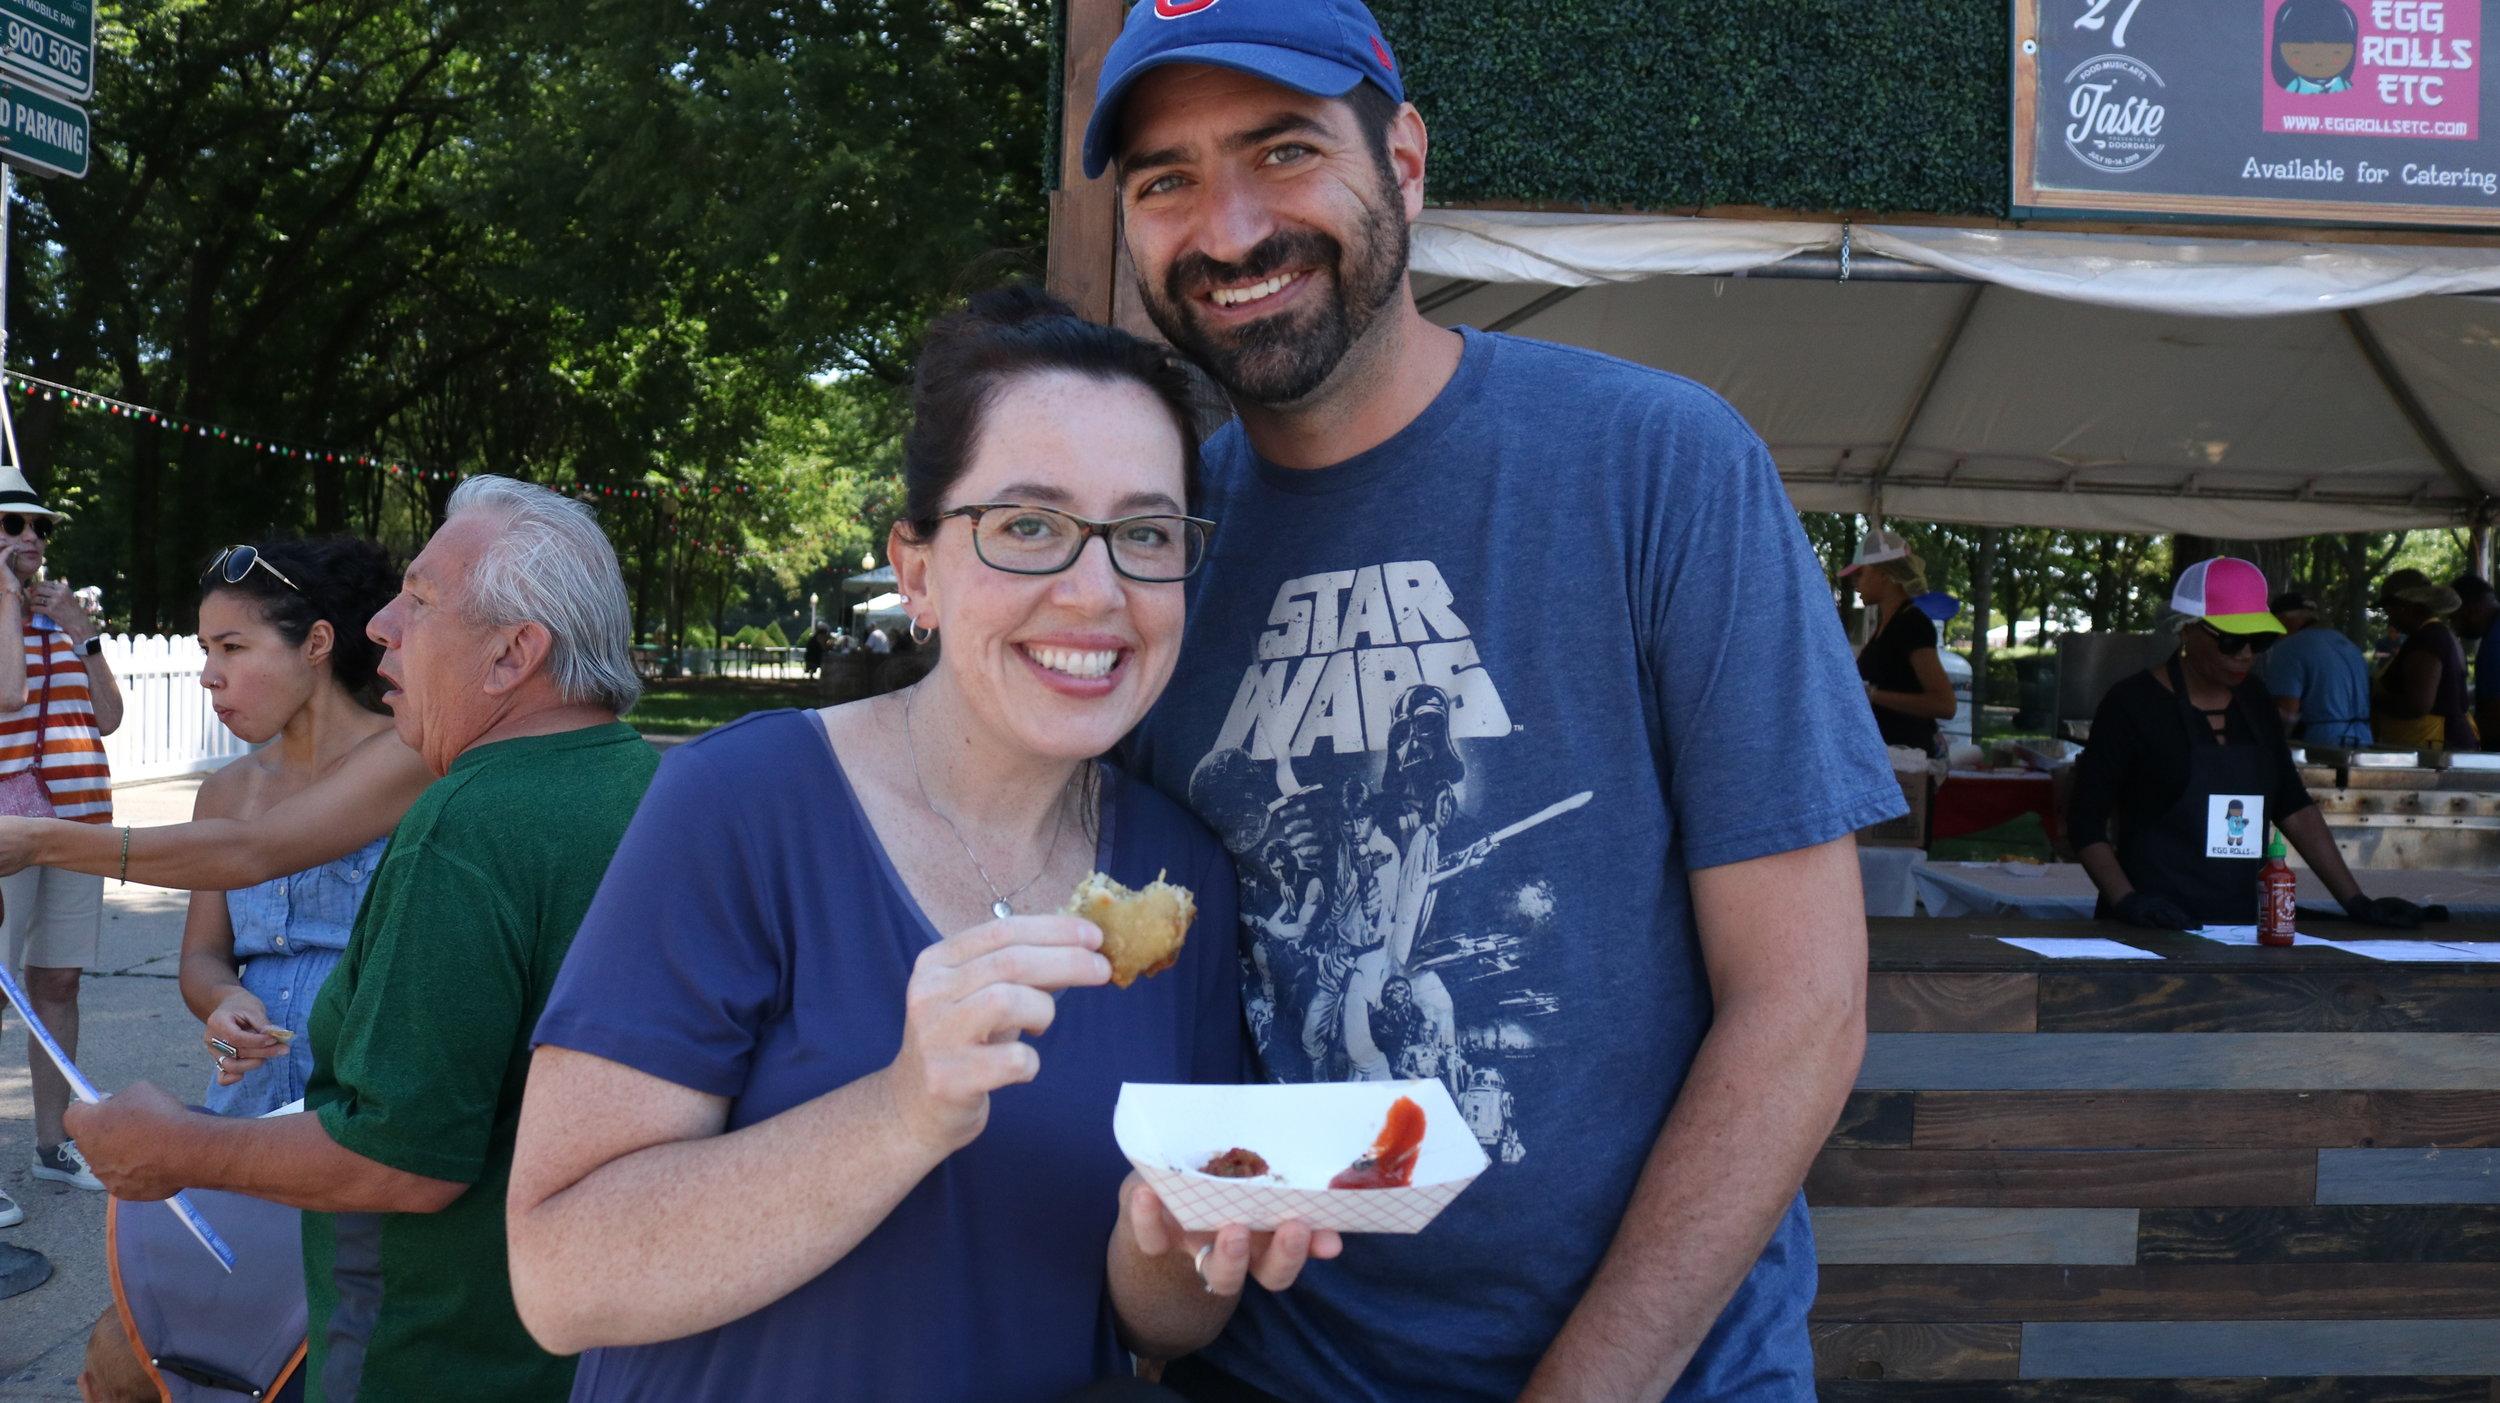 A couple enjoying a Mild Buffalo Chicken Egg Roll from Egg Roll Etc. Photo by Clariza Adao